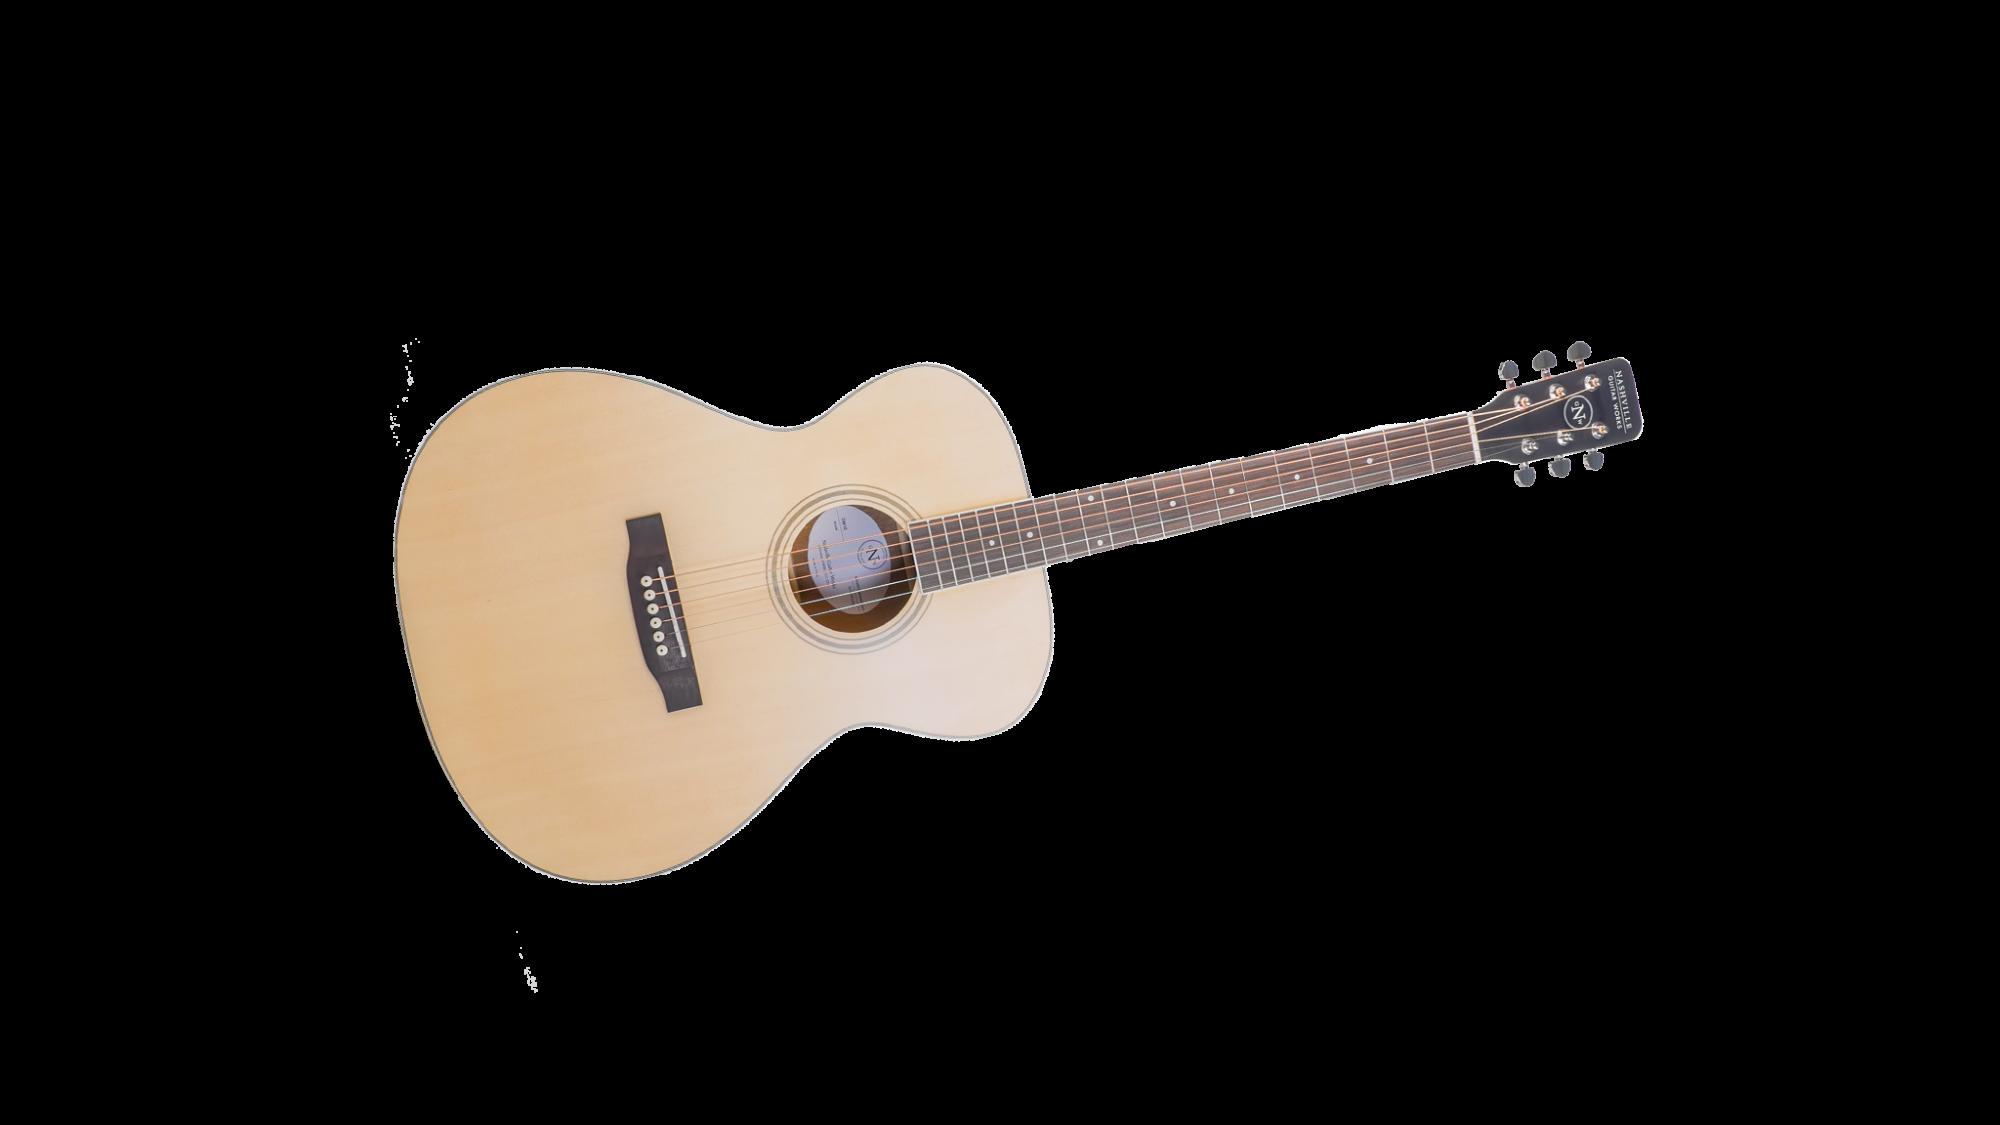 NGW OM10 Concert Acoustic Guitar